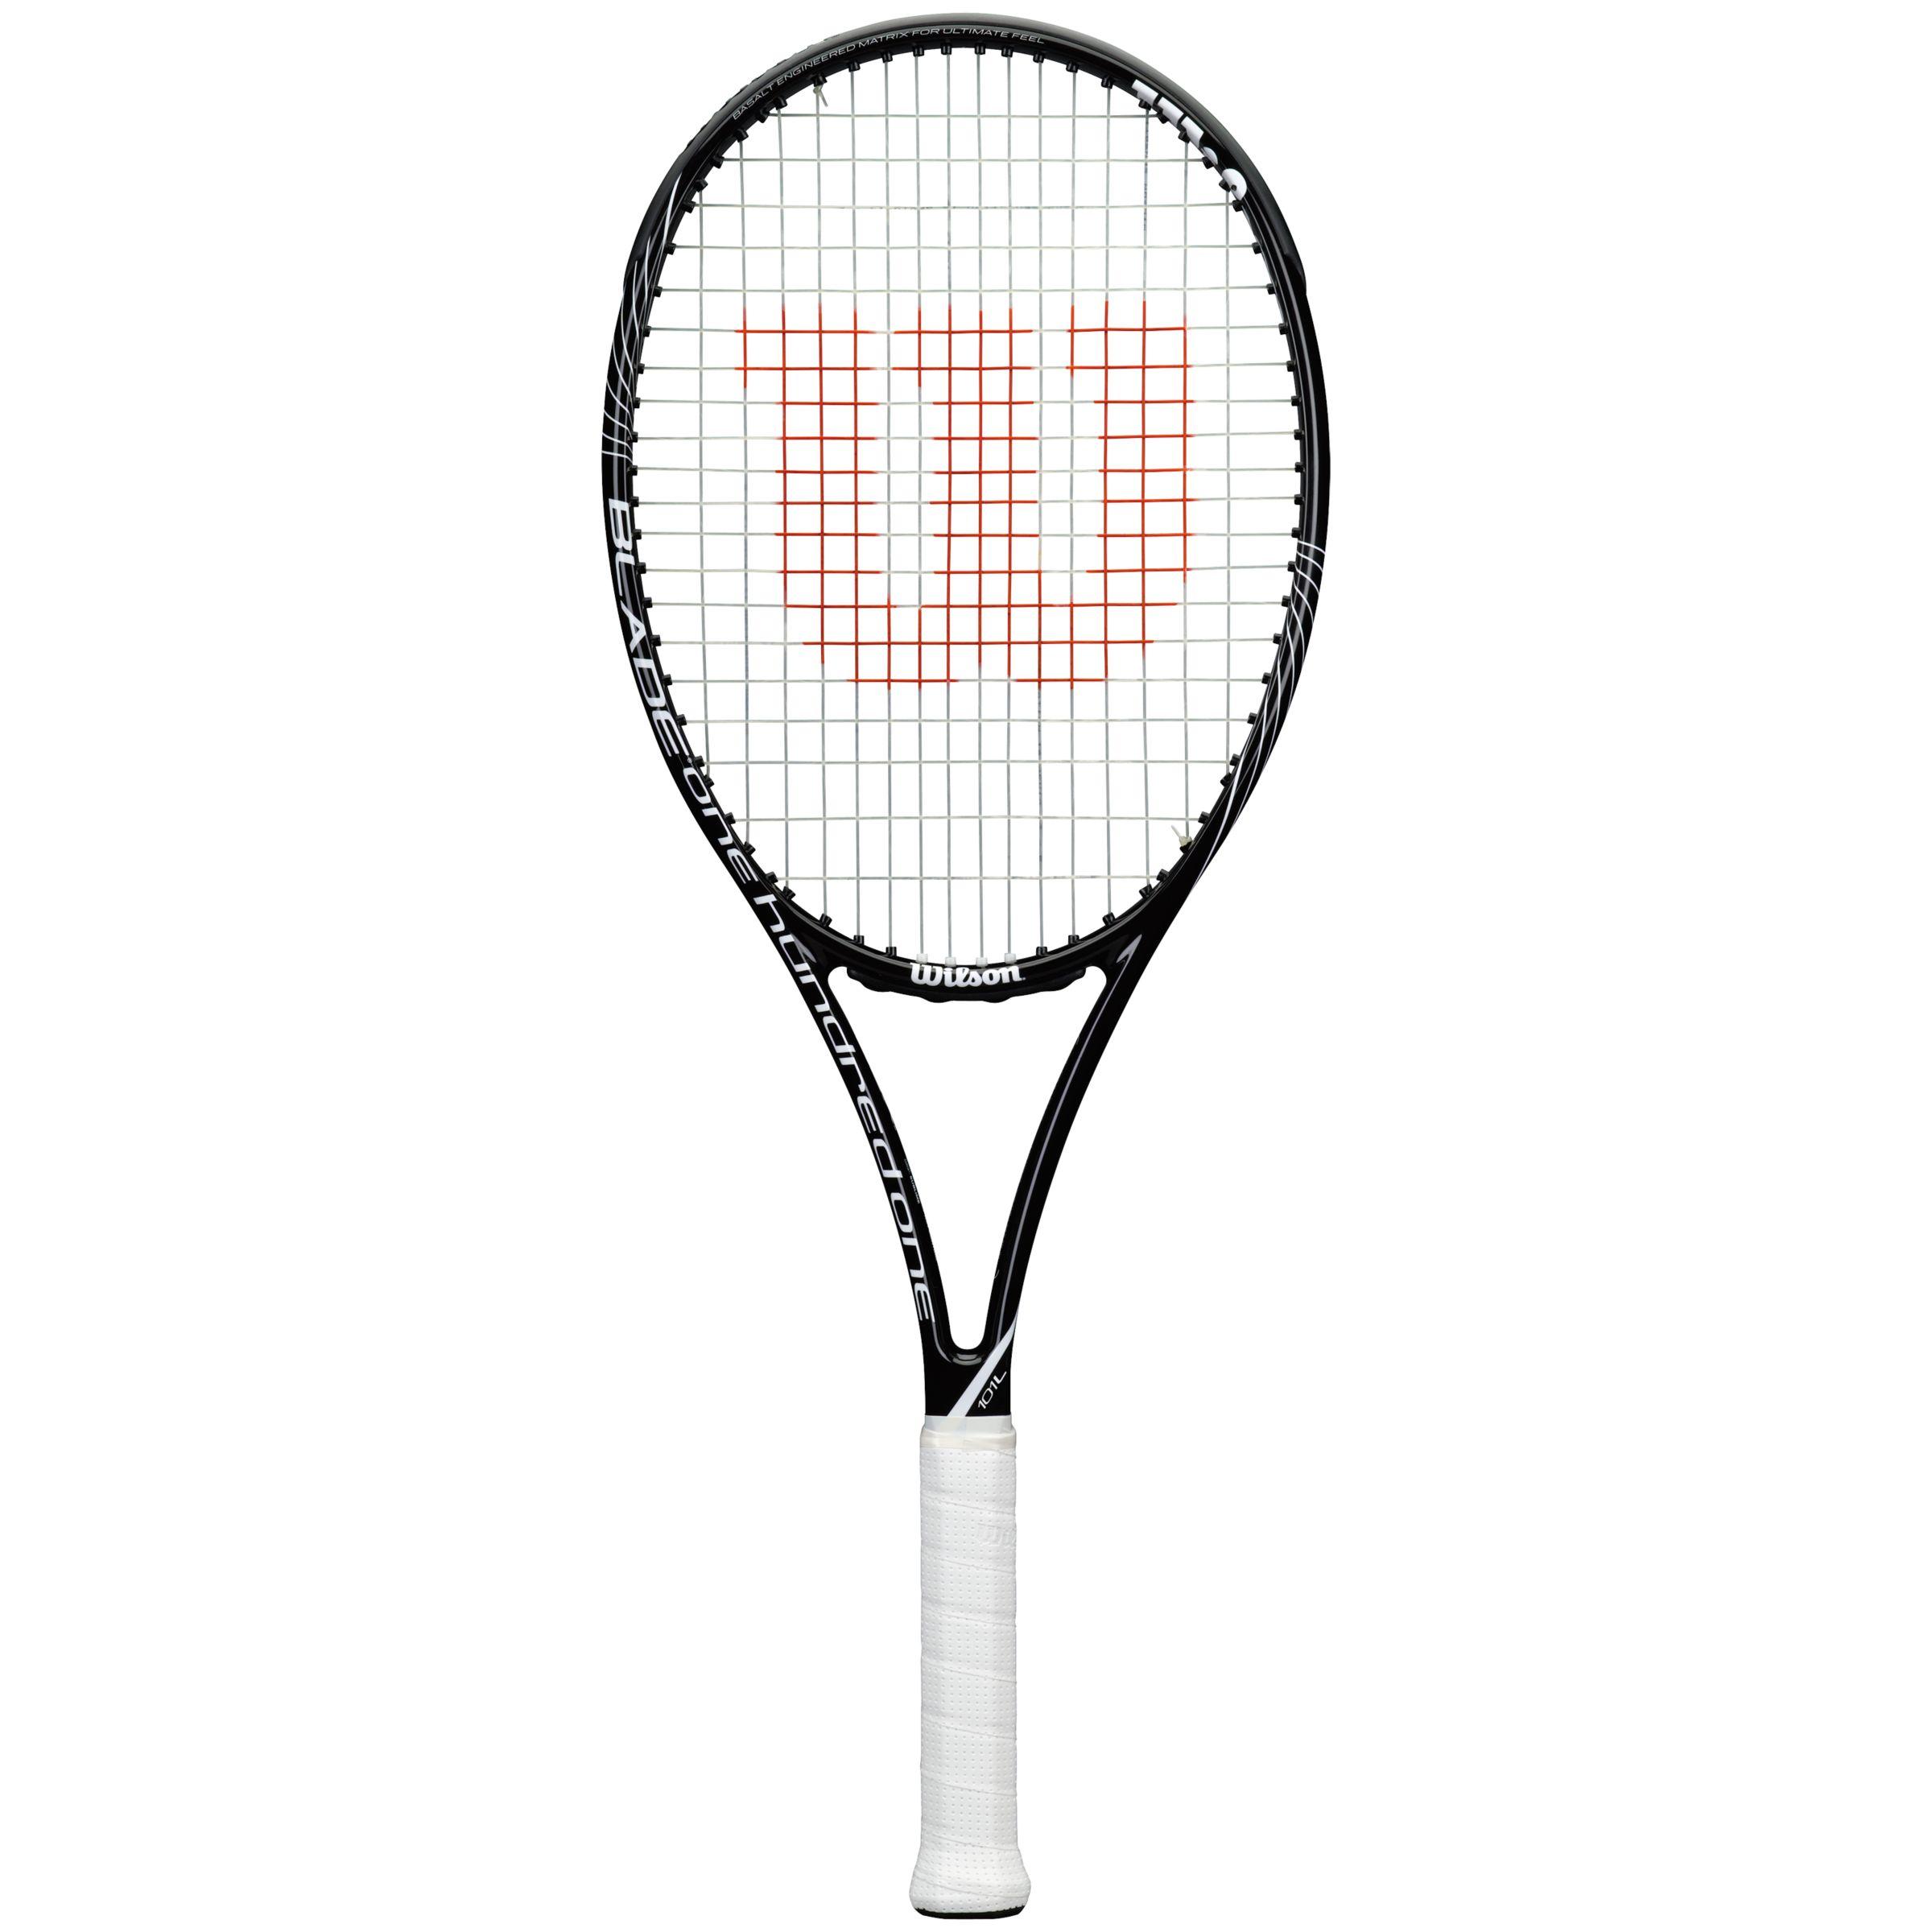 Wilson Wilson Blade Tennis Racket, Black